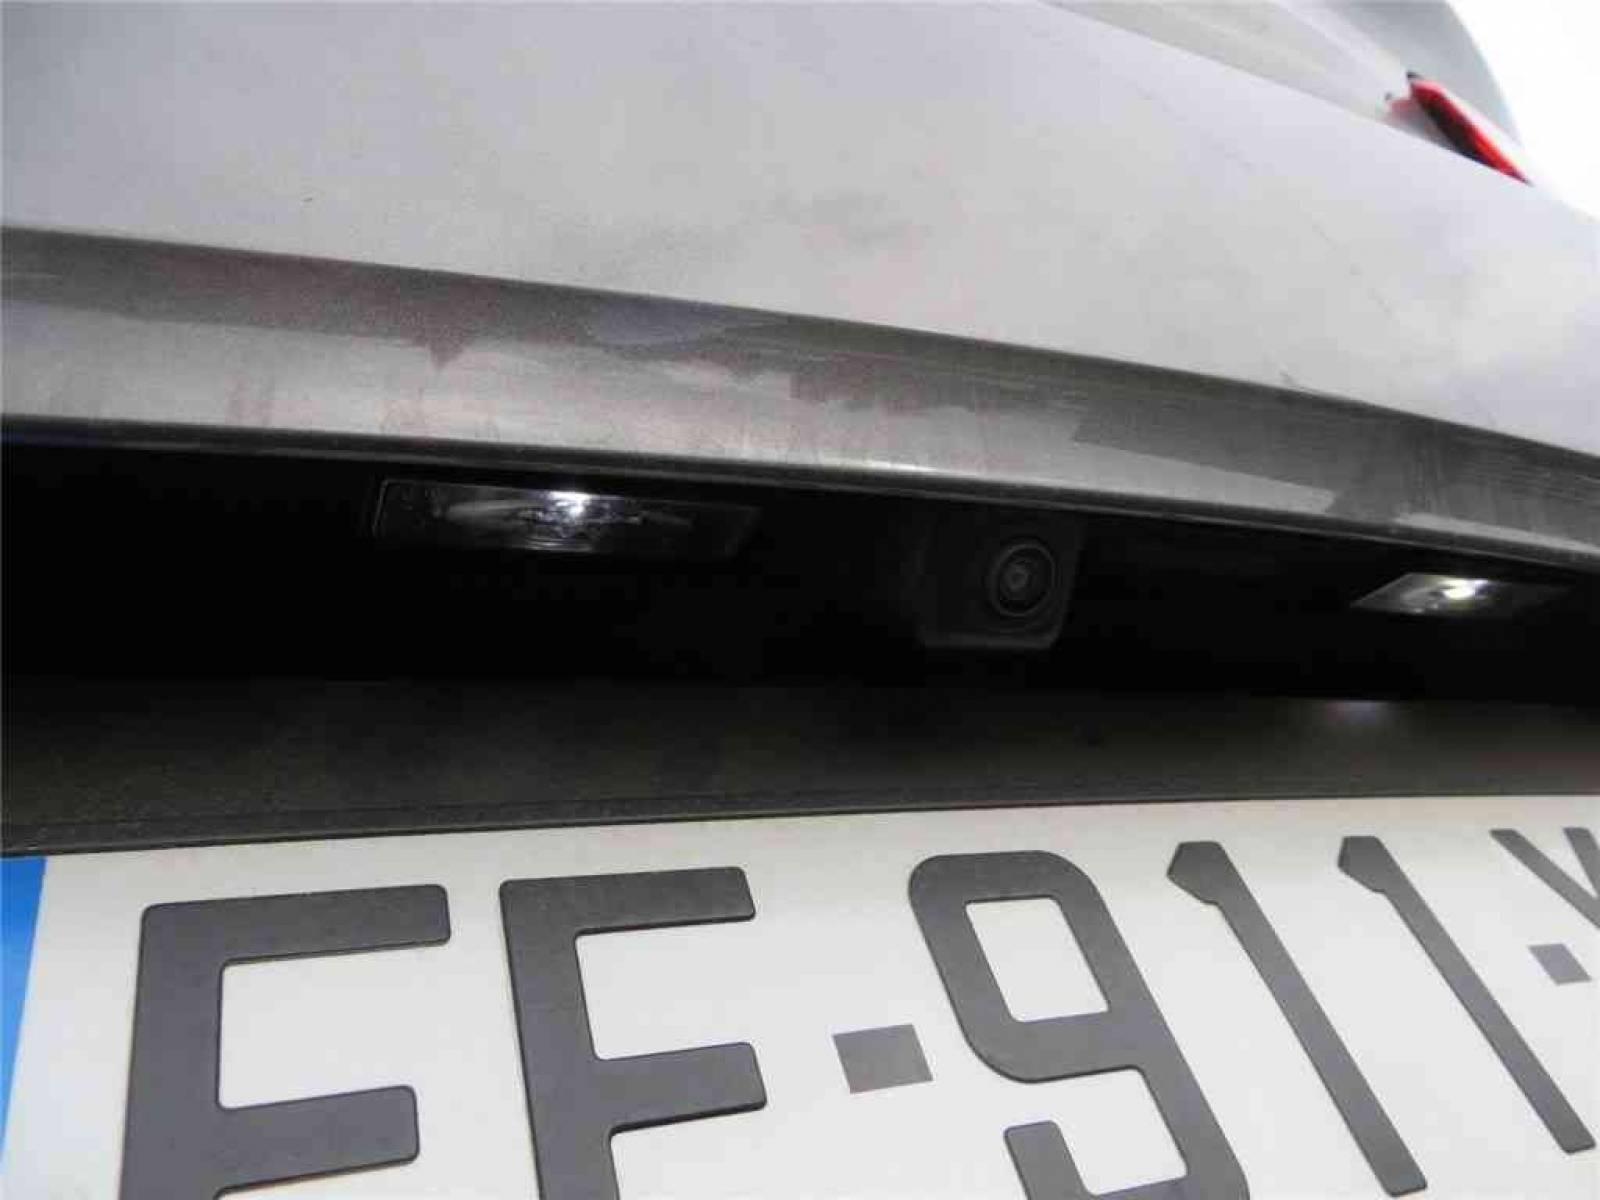 OPEL Grandland X 1.5 Diesel 130 ch BVA6 - véhicule d'occasion - Groupe Guillet - Opel Magicauto - Chalon-sur-Saône - 71380 - Saint-Marcel - 6